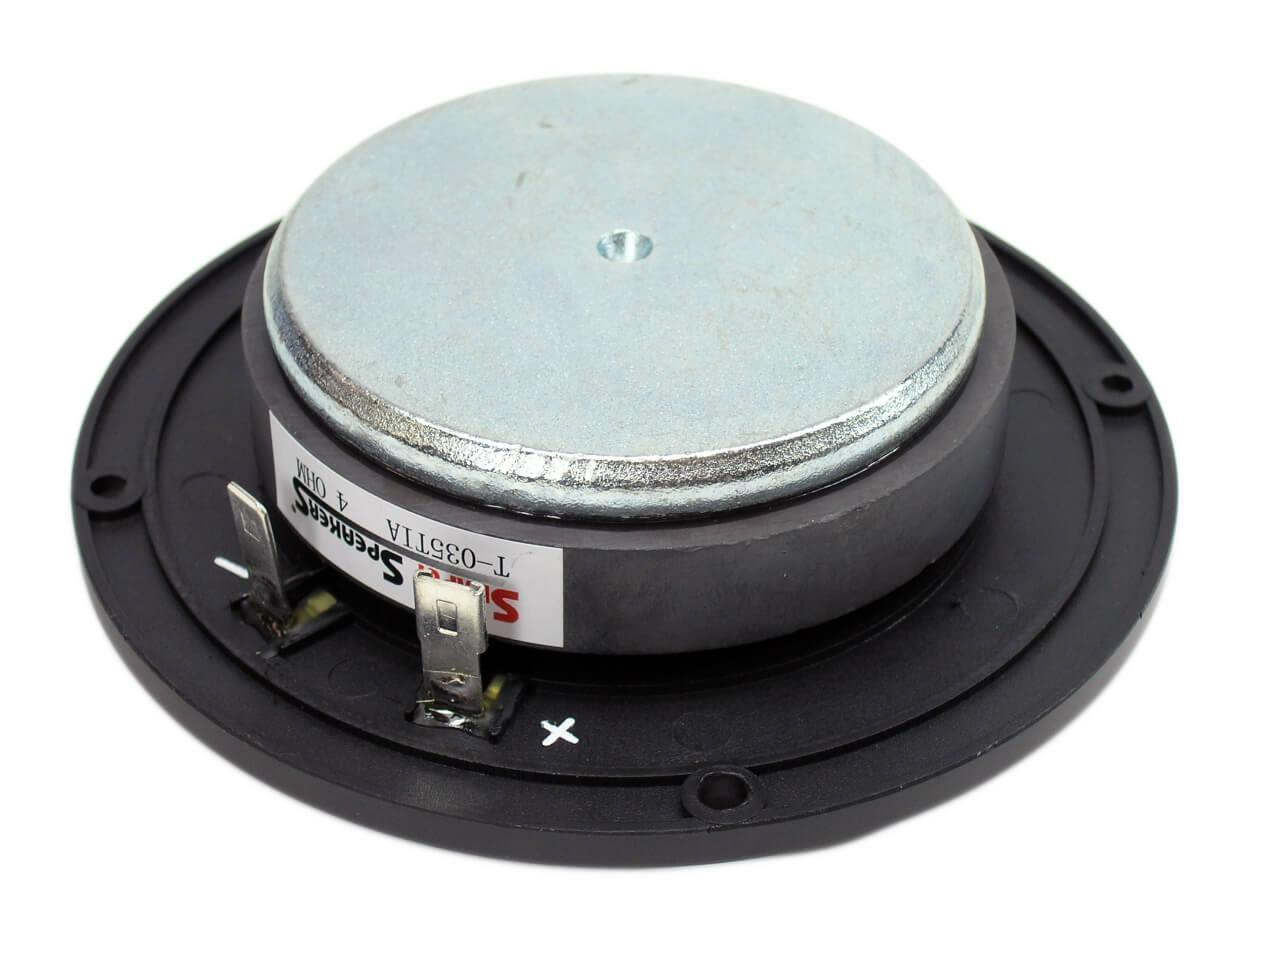 Jbl L100t3 Wiring Diagram Change Your Idea With Loudspeaker Diagrams Rh 28 Shareplm De L100t 4412a